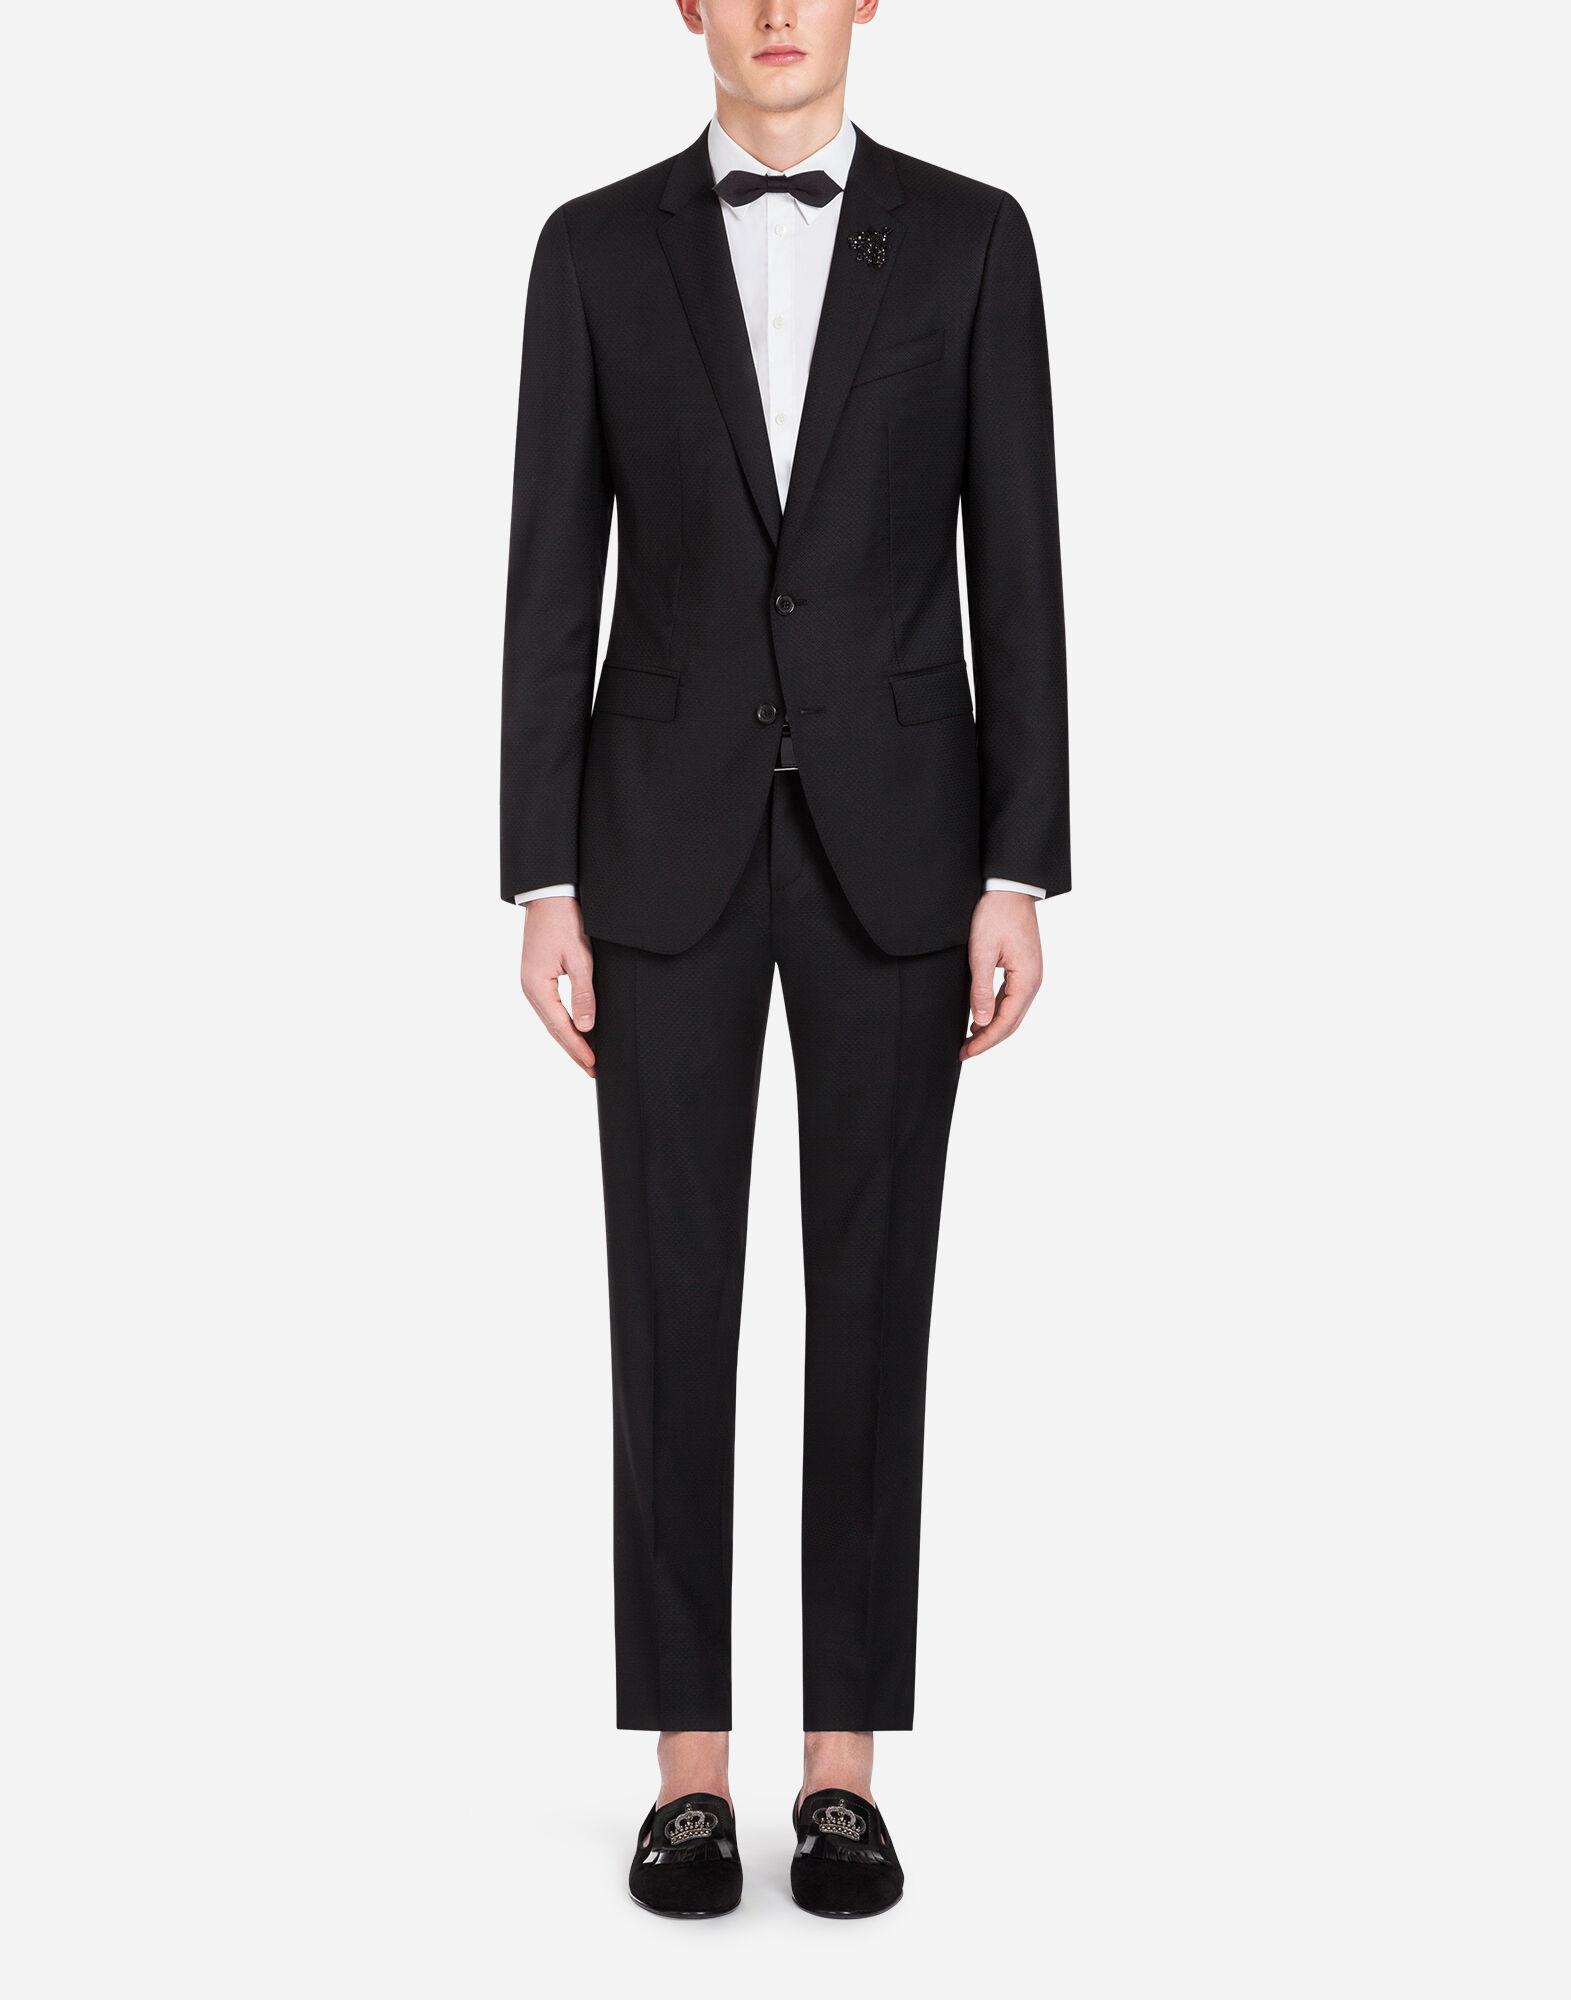 Dolce&Gabbana スーツ マティーニ ジャカードウール パッチ